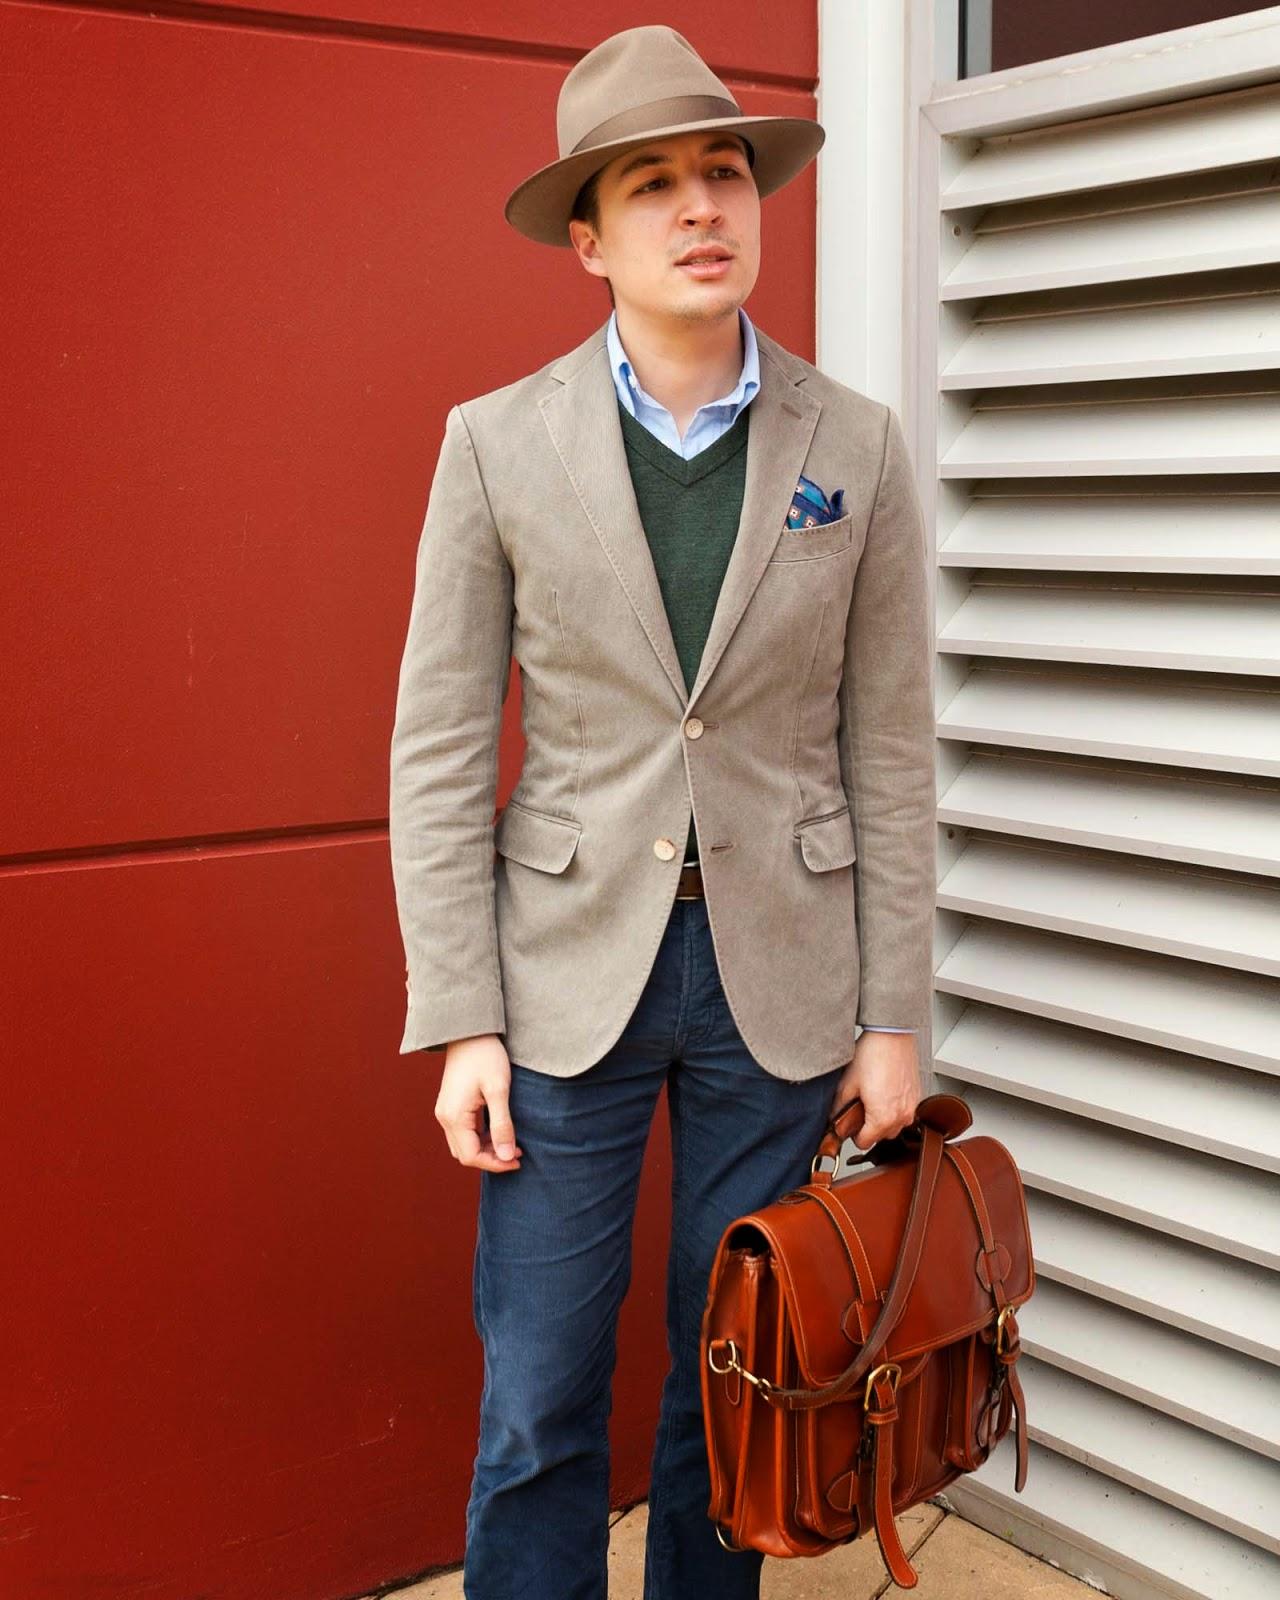 Gap Pants, Clarks Shoes, Suit Supply Blazer, Jack Jones Sweater, Brooks Brothers Shirt, Akubra Hat